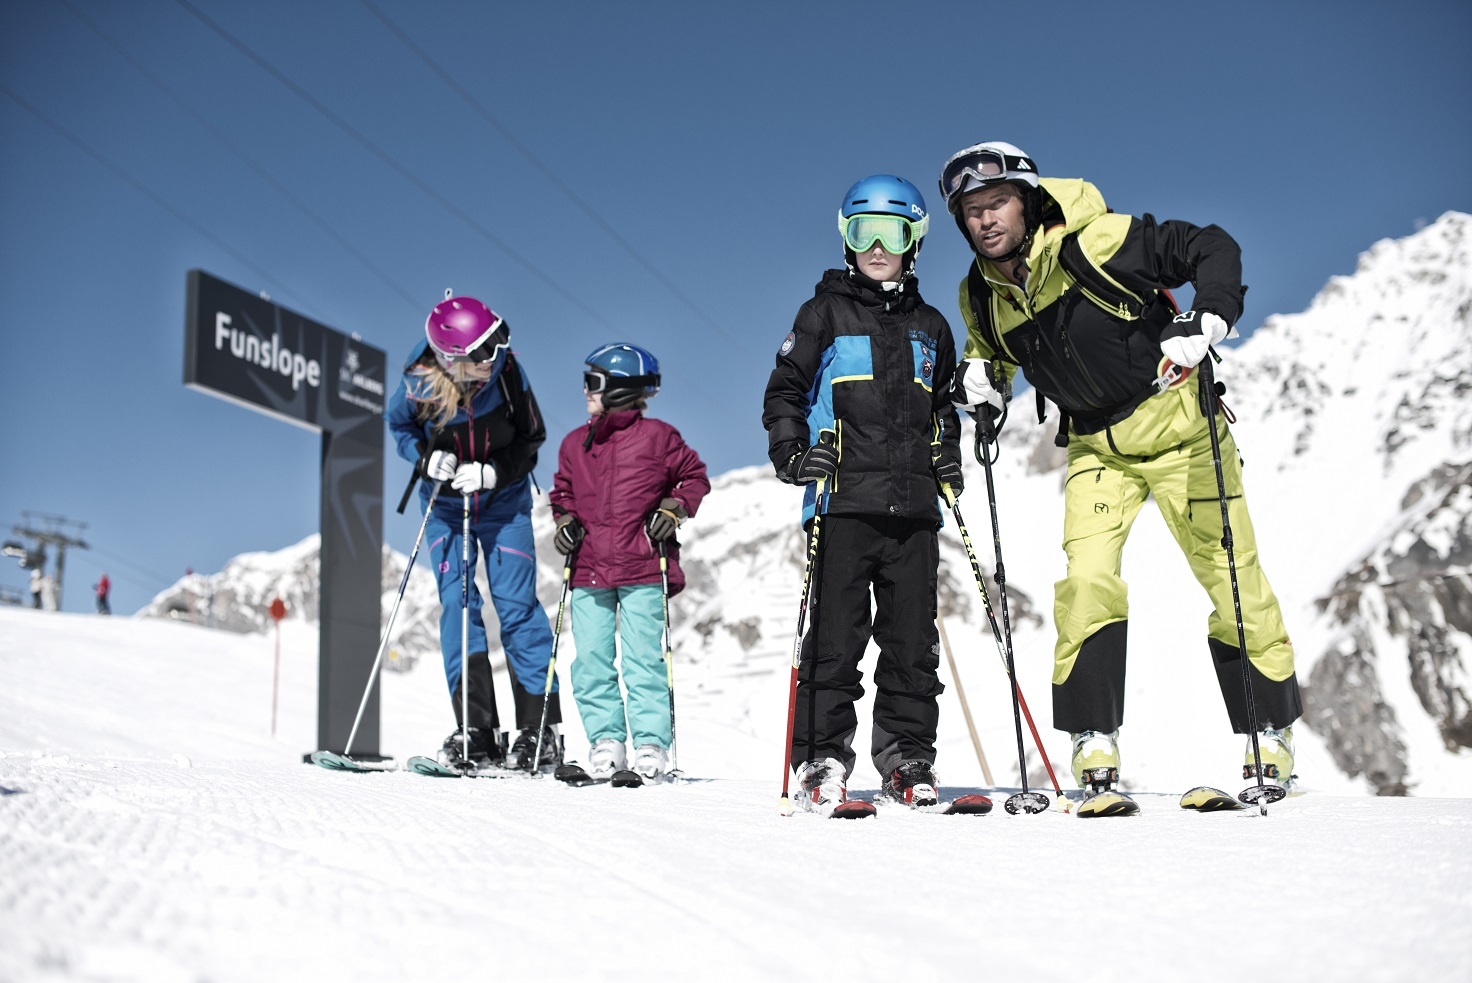 funslope_galzig_st._anton_am_arlberg_c_arlberger_bergbahnen_ski_arlberg